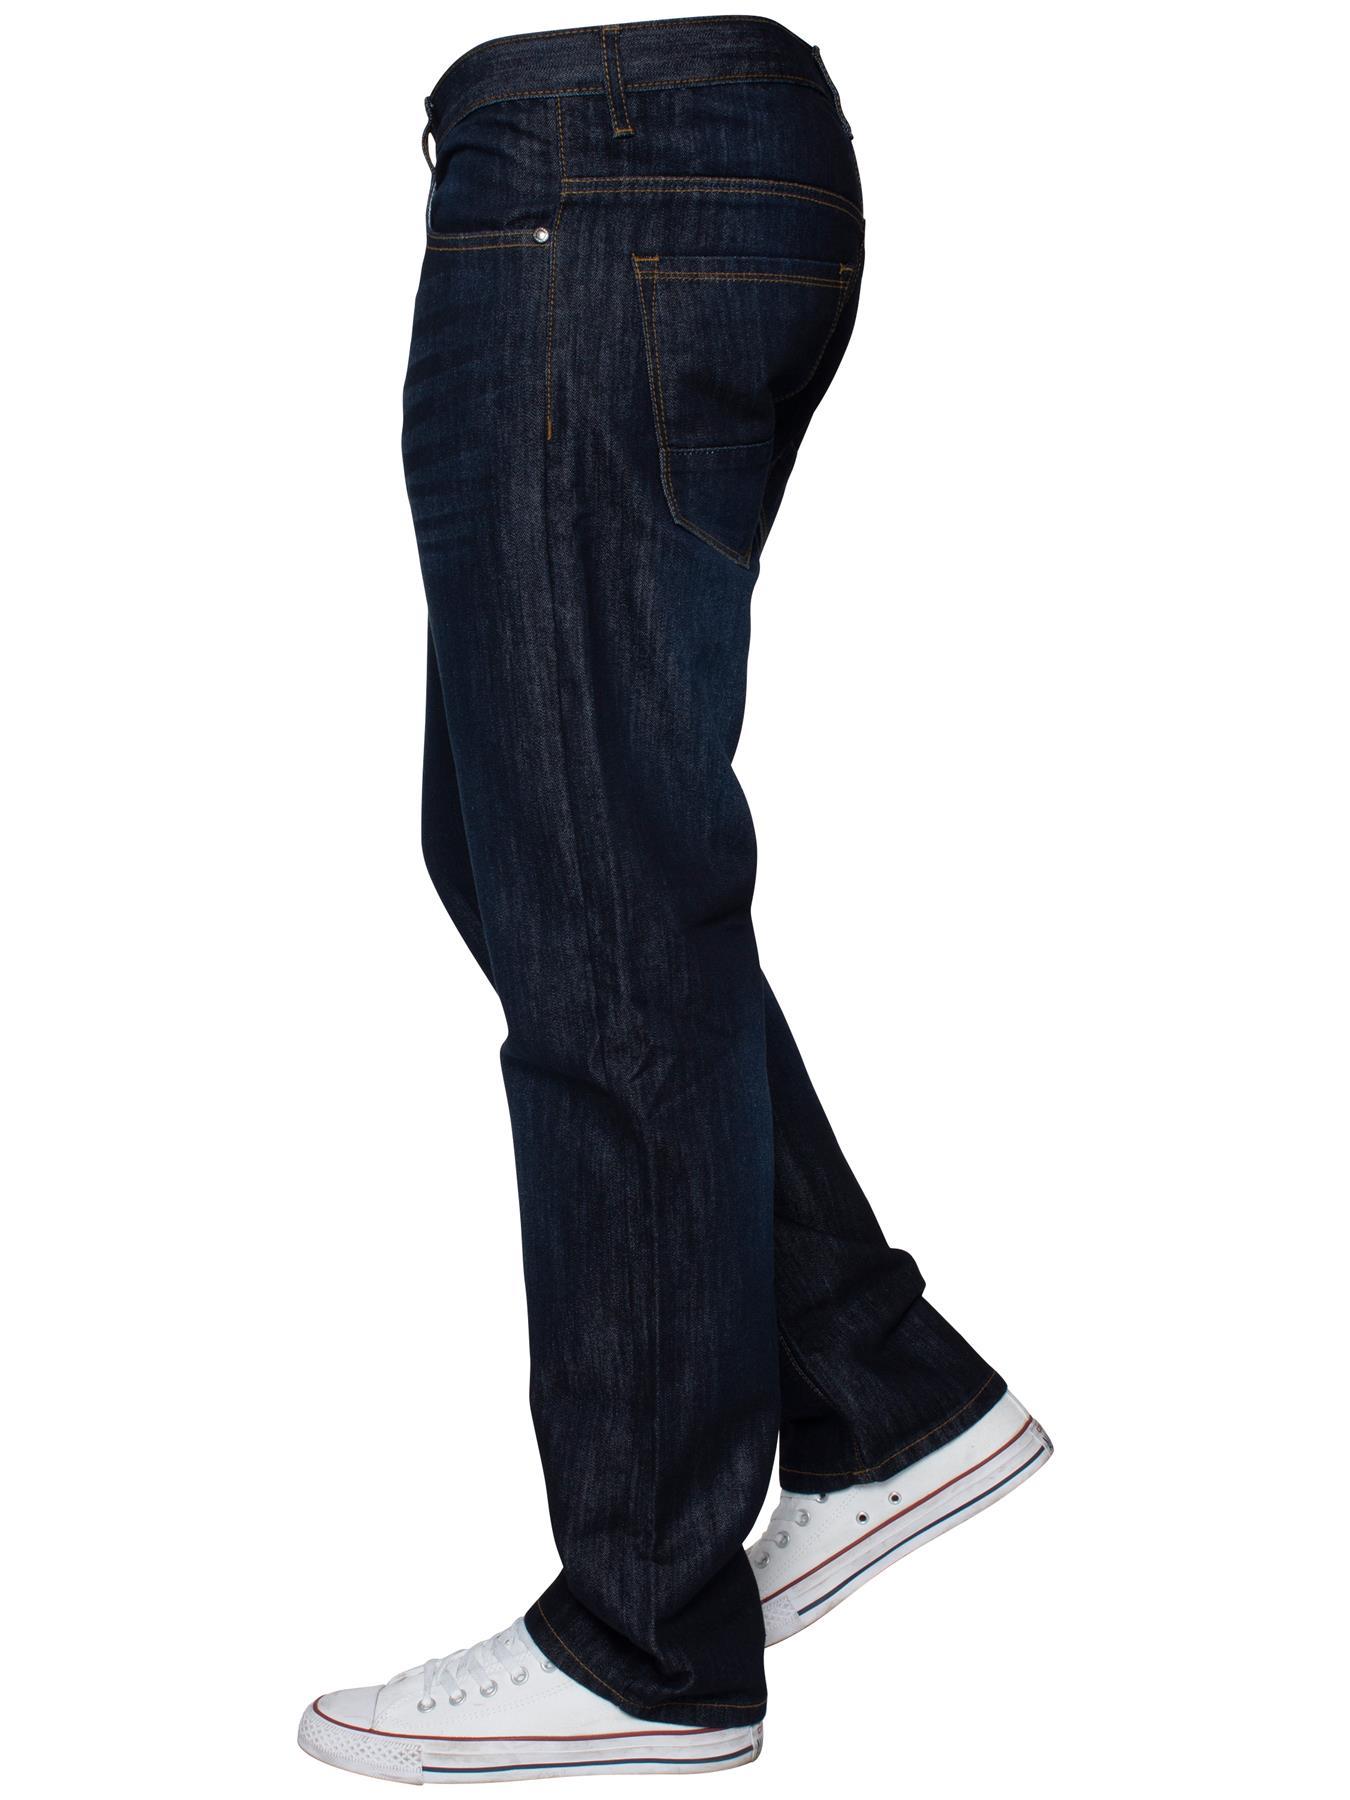 Mens-Regular-Fit-Jeans-Straight-Leg-Denim-Pants-Trousers-Pants-All-Waist-Sizes thumbnail 19